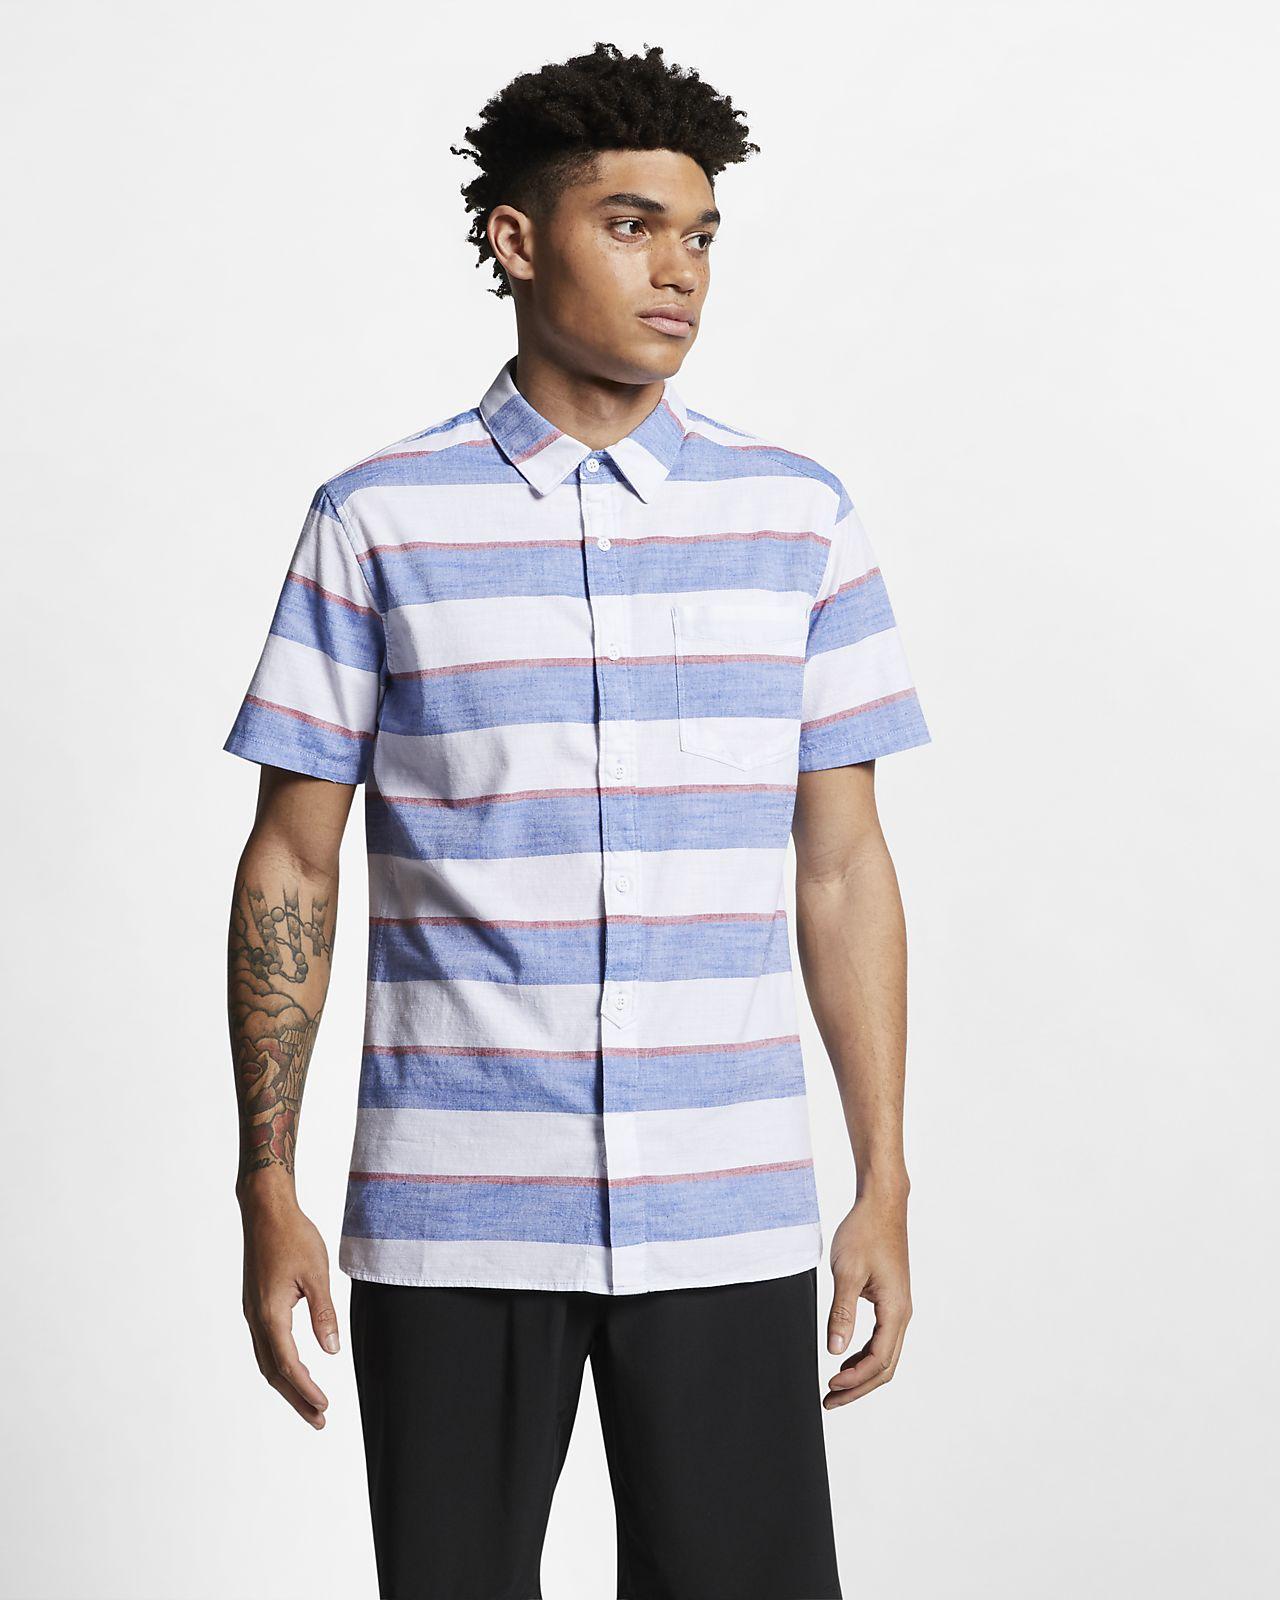 393fd751514c Hurley Blocked Men s Striped Short-Sleeve Shirt. Nike.com